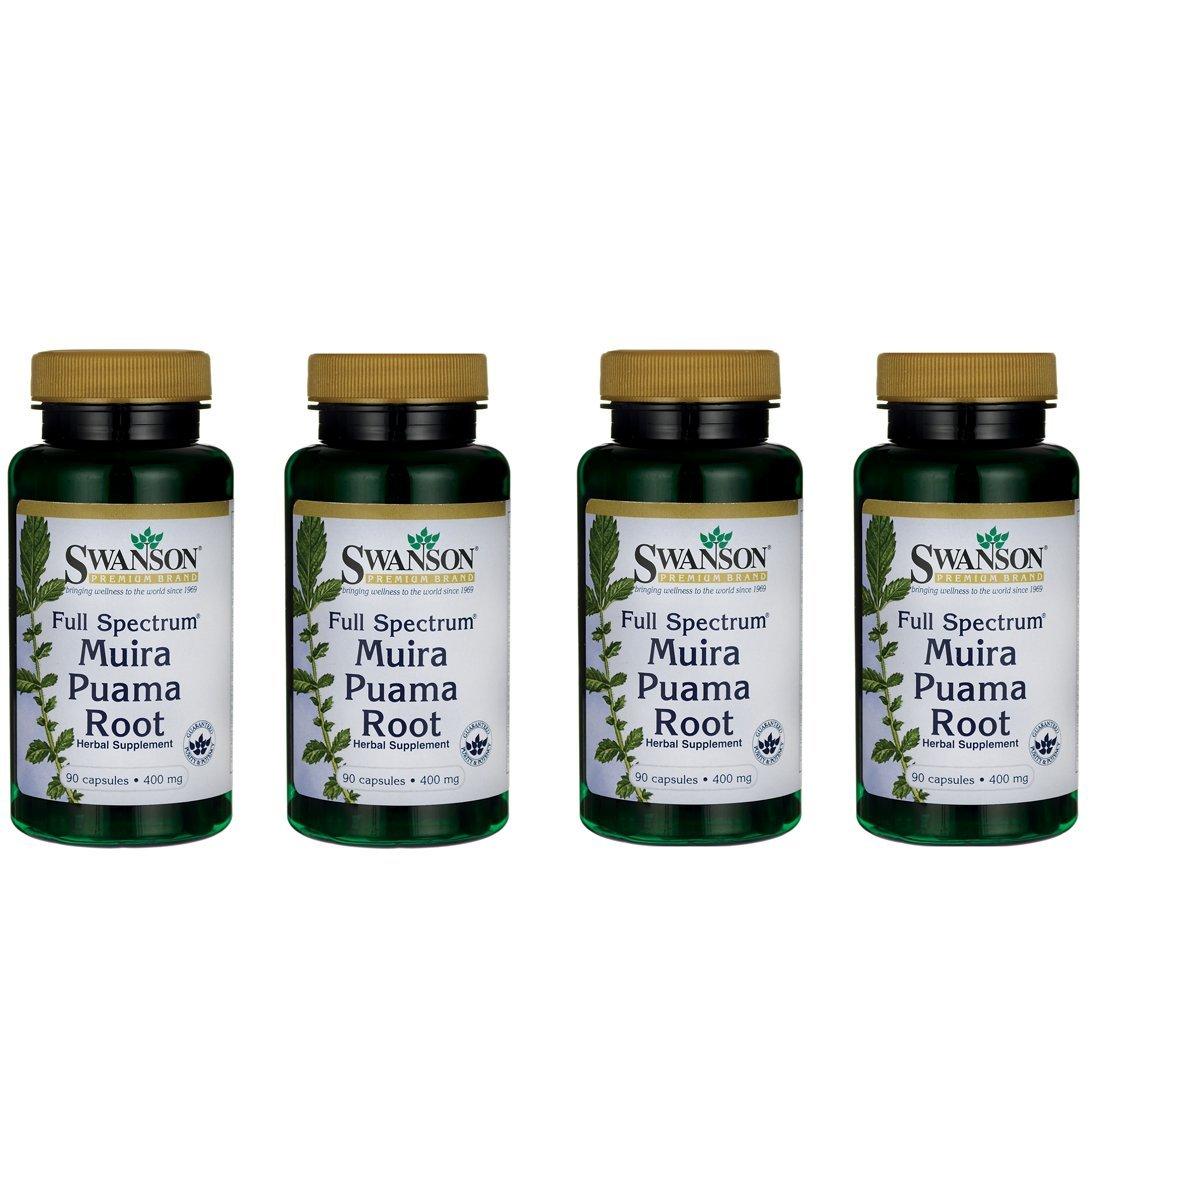 Swanson Muira Puama Root Sexual Health Virility Libido Boost Support Men's Women's Supplement 400 mg 90 Capsules (4 Pack)